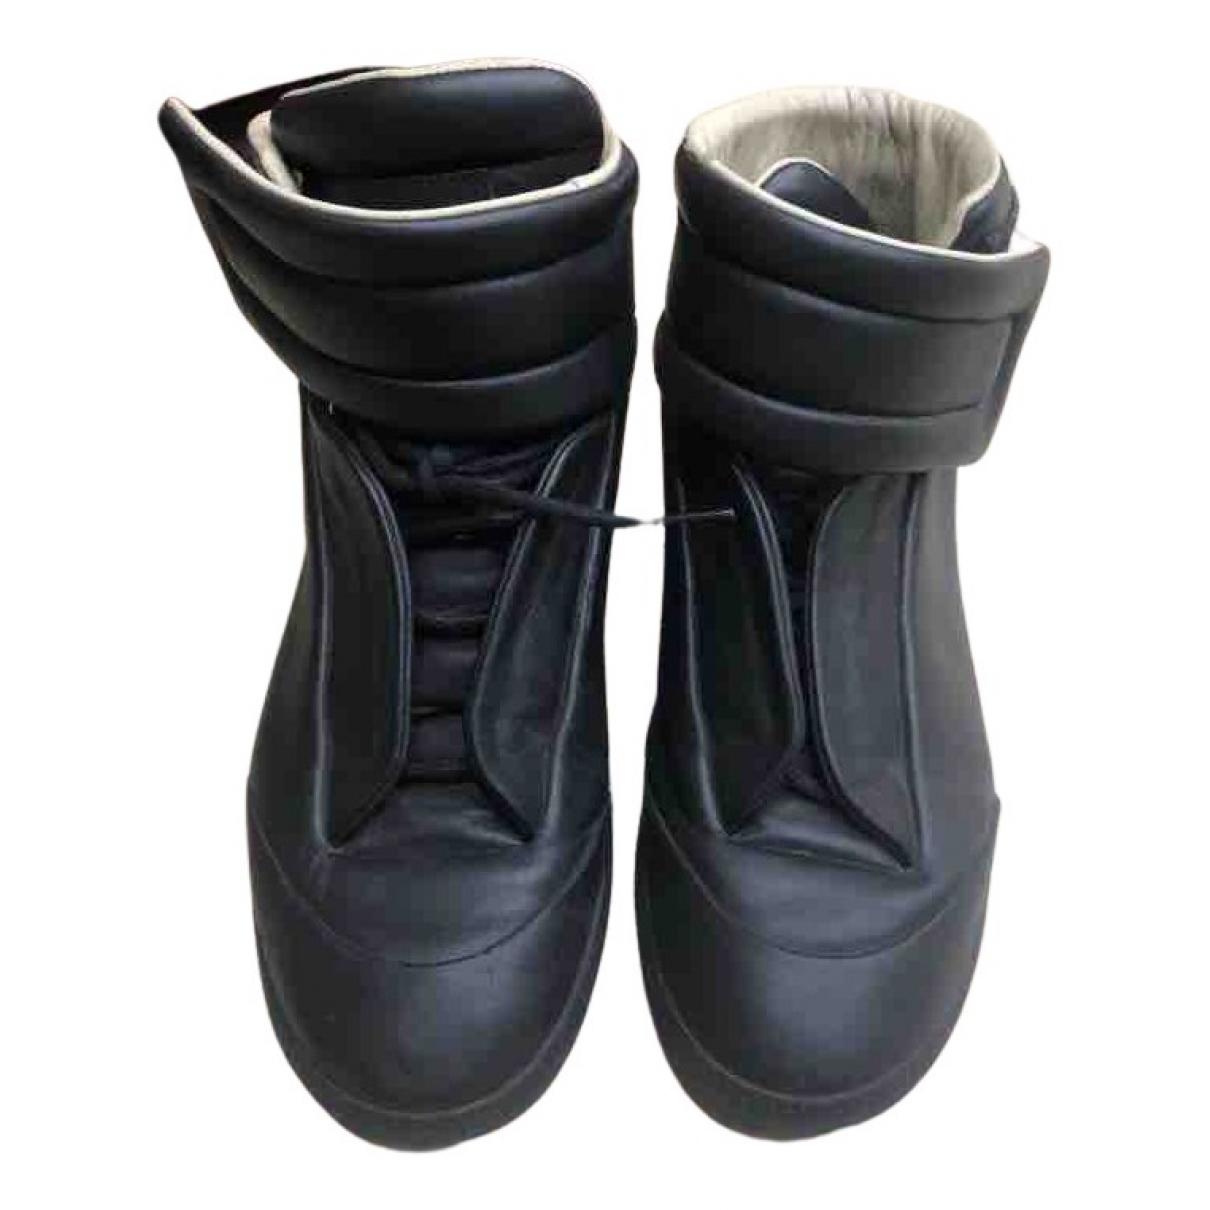 Maison Martin Margiela \N Sneakers in  Schwarz Leder